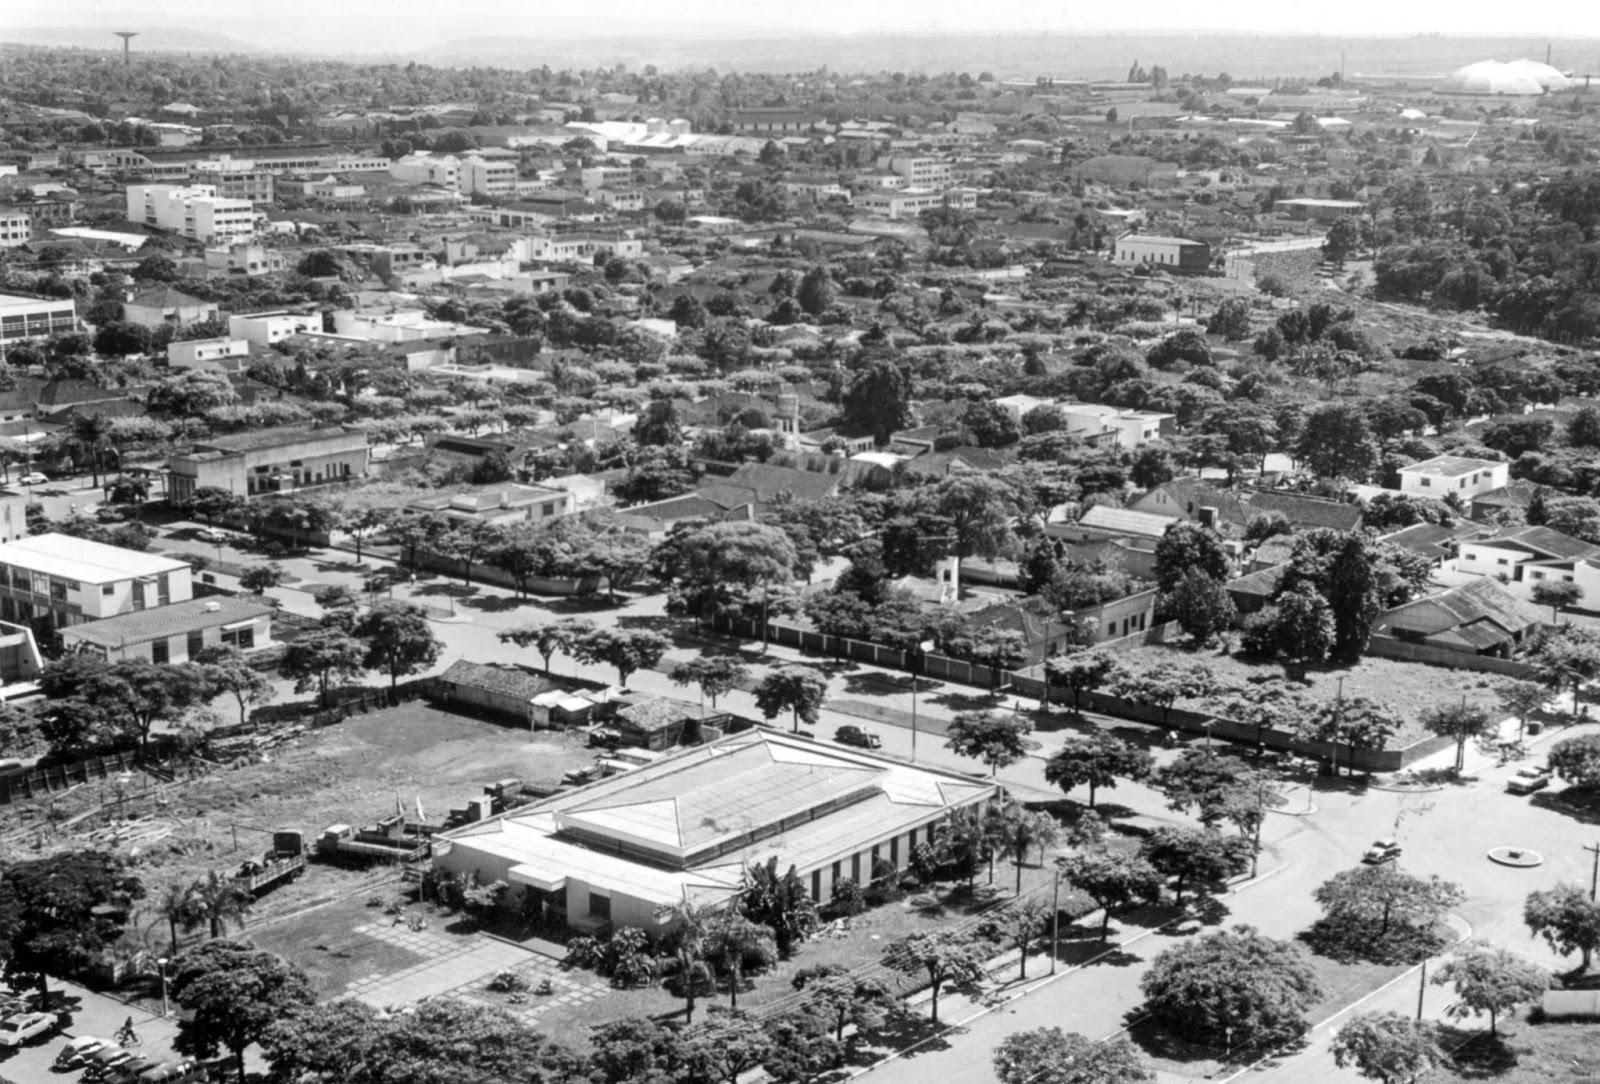 Avenida Herval x Avenida Tiradentes - Década de 1960